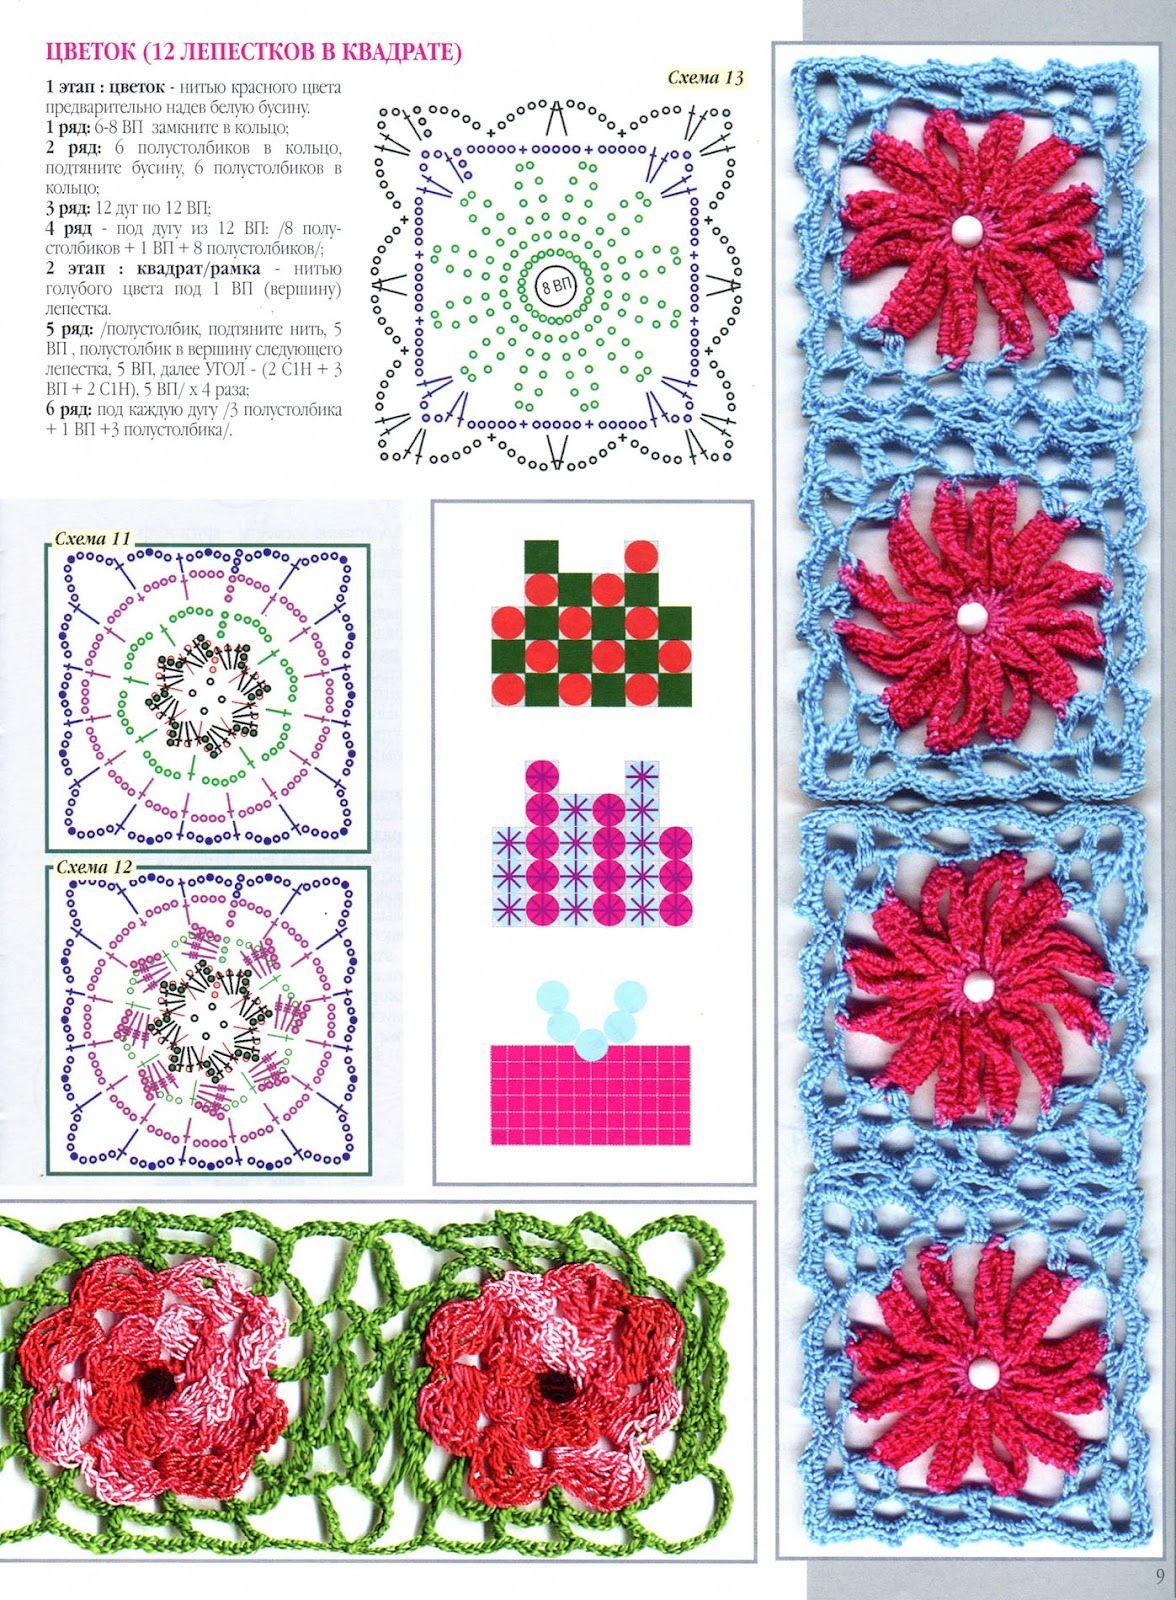 Pin de Durley Guerrero en croche | Pinterest | Cuadros con flores ...